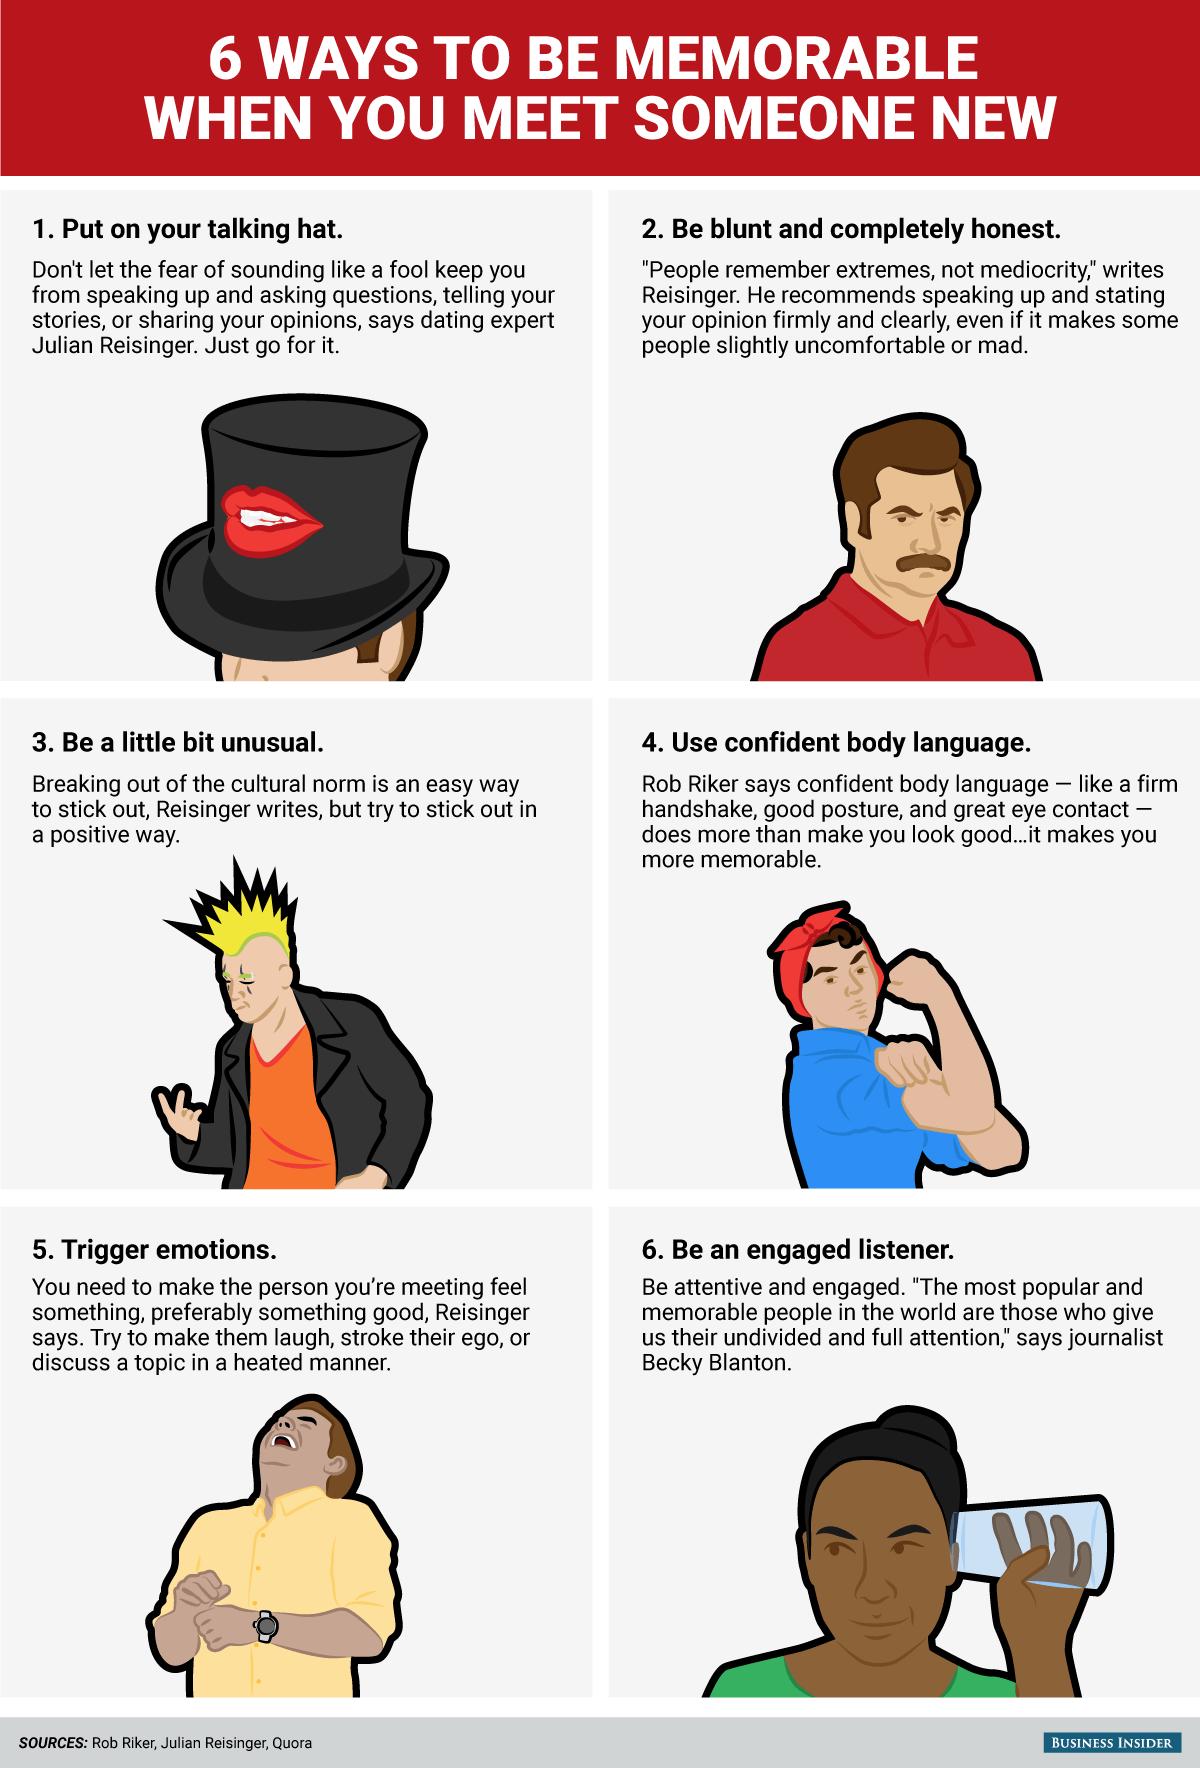 seis formas de ser memorable